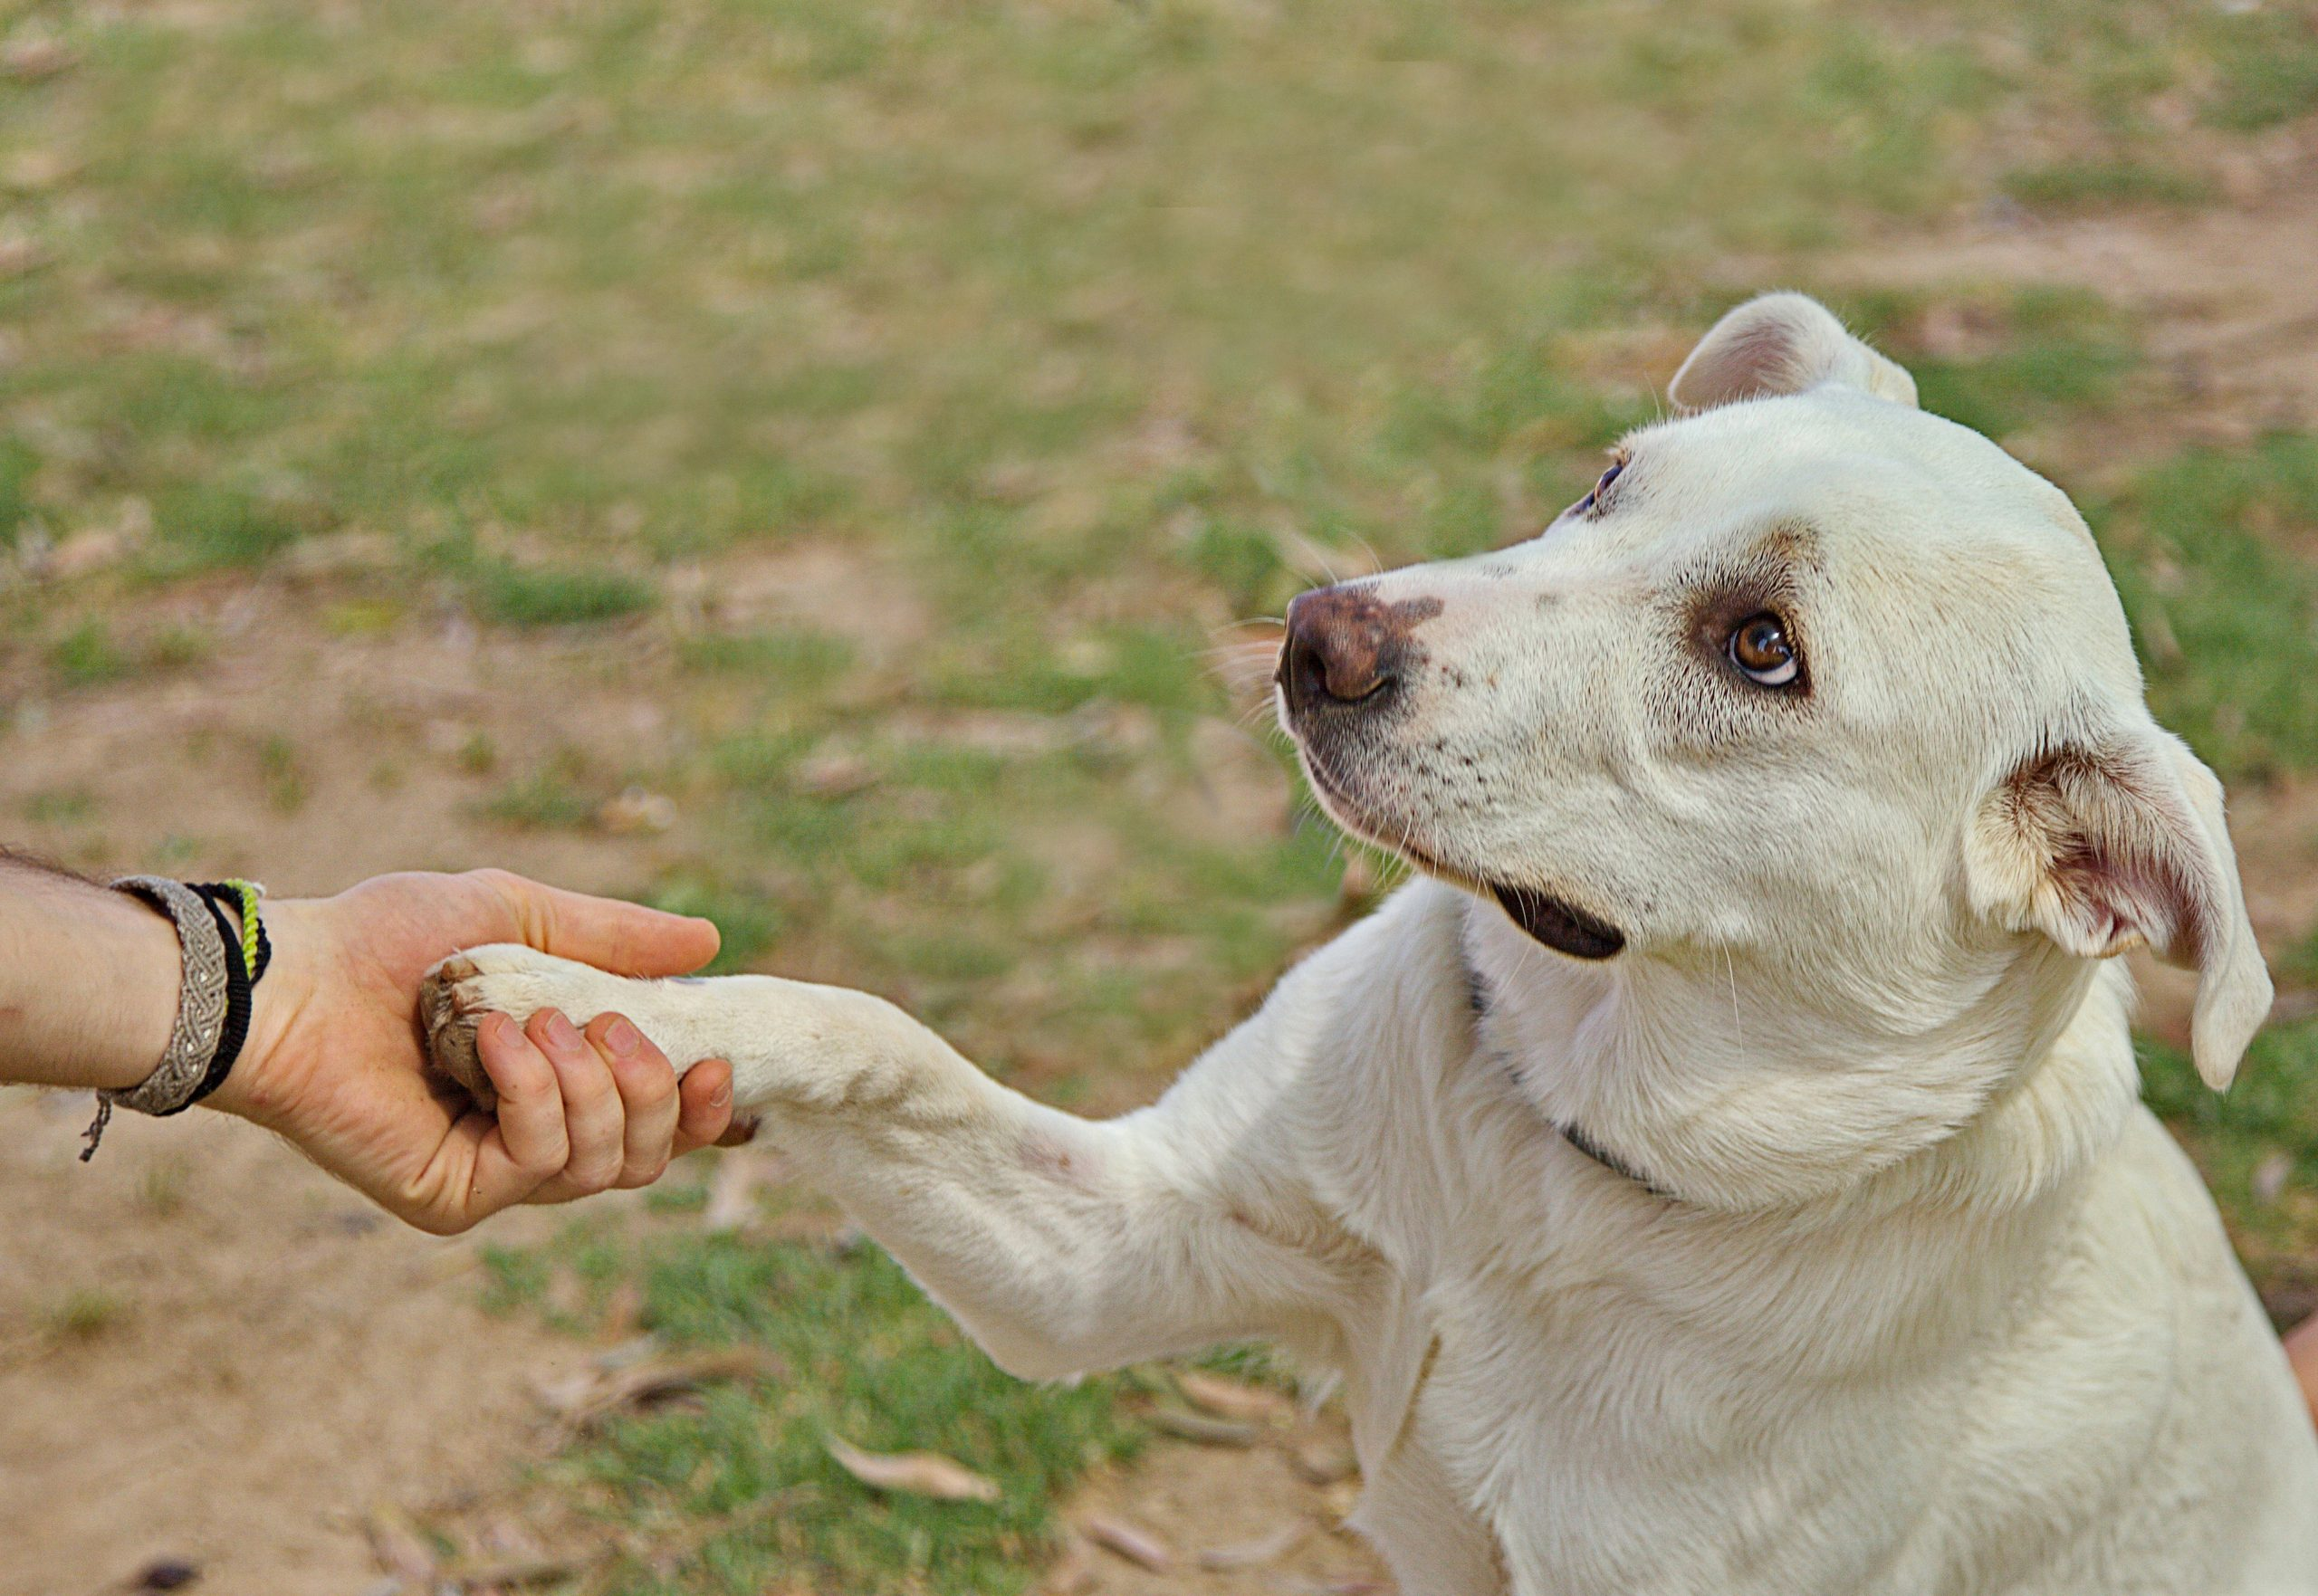 Perro estrechando su pata a una persona